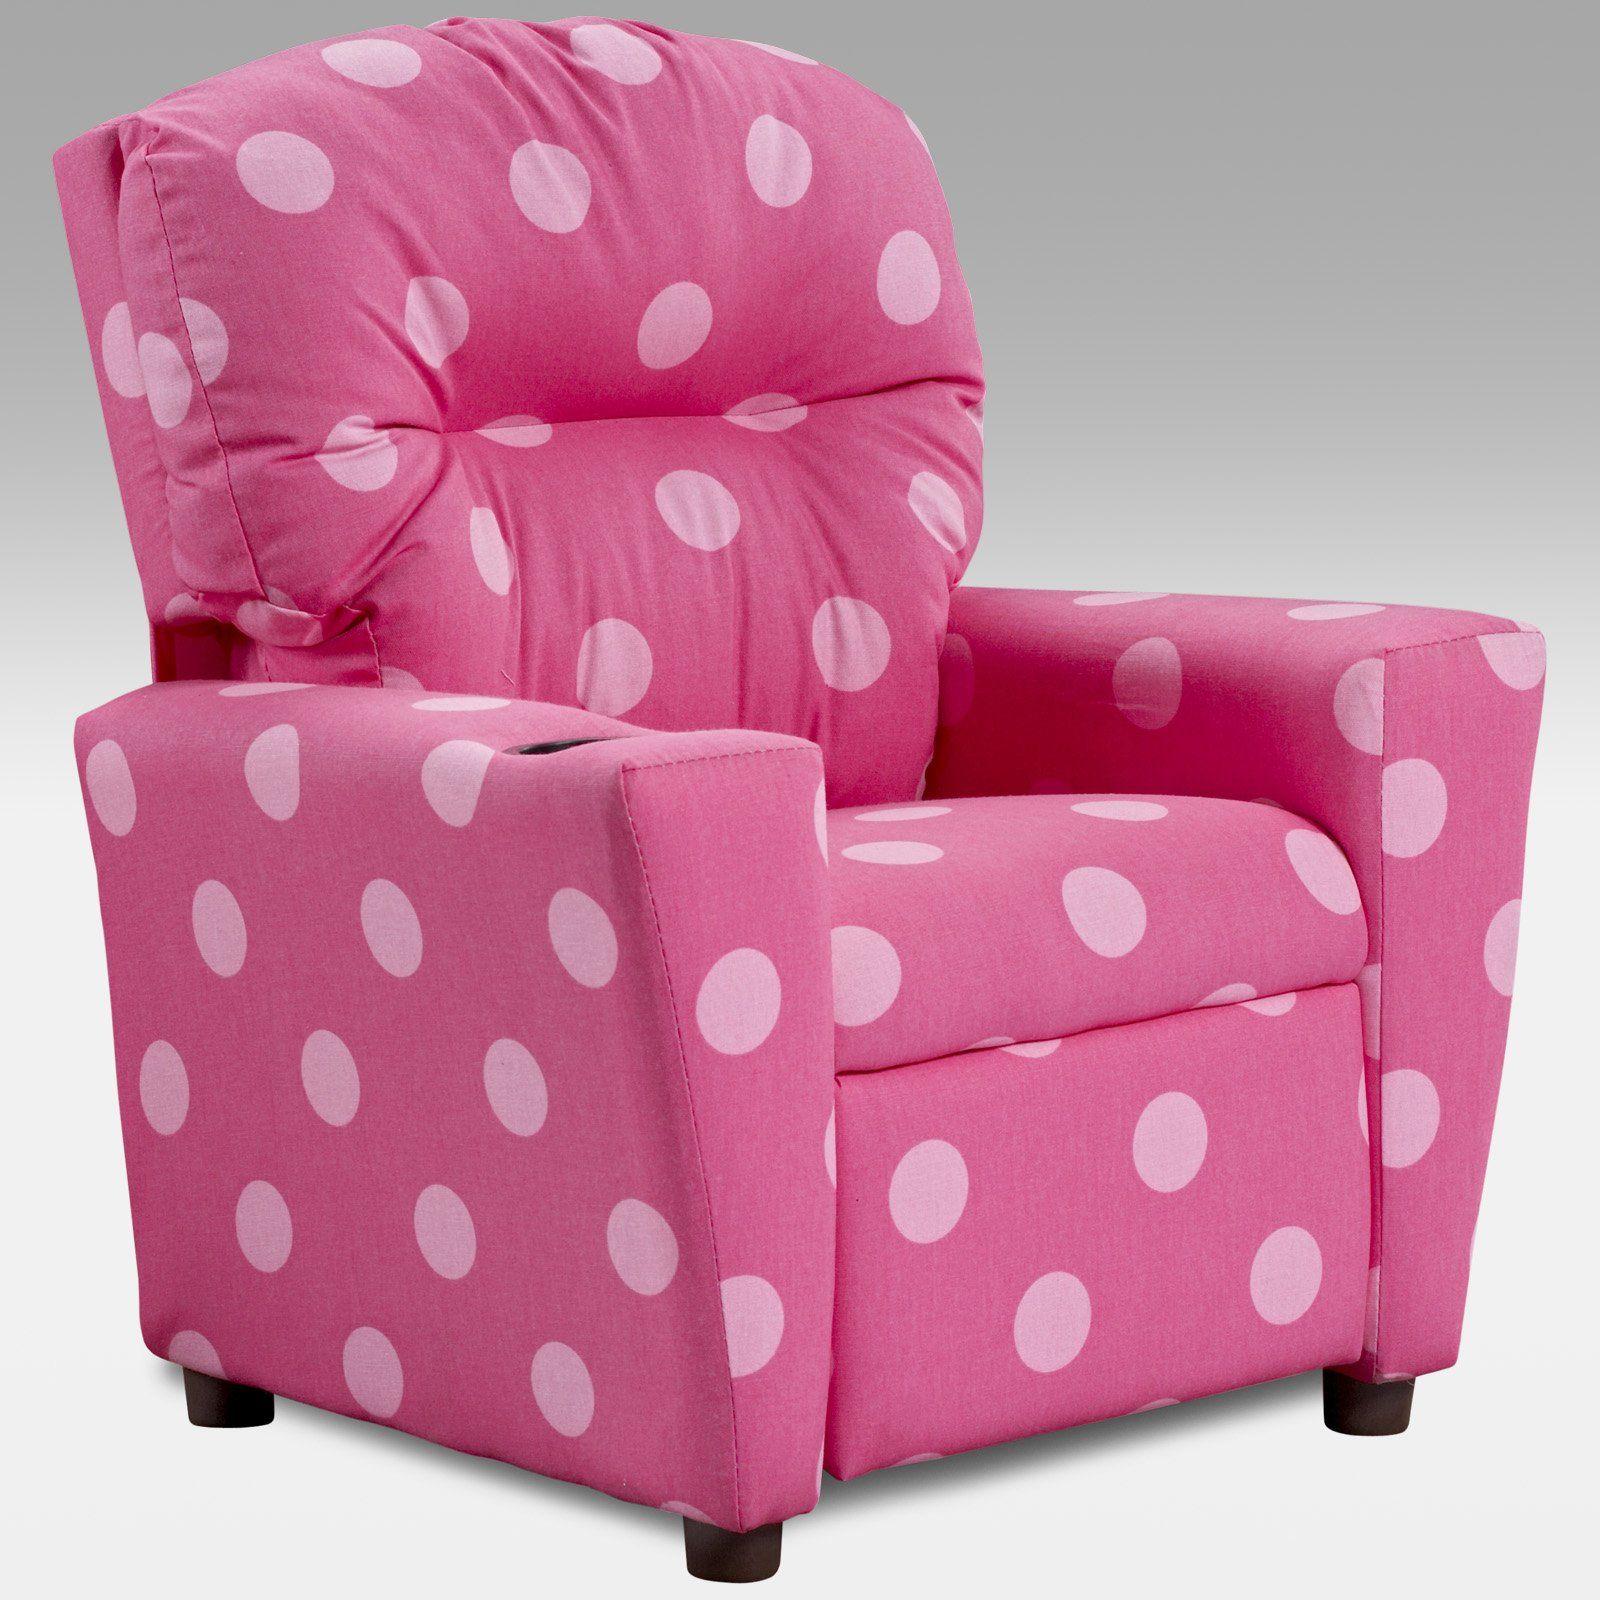 die besten 25 kinder relaxsessel ideen auf pinterest. Black Bedroom Furniture Sets. Home Design Ideas